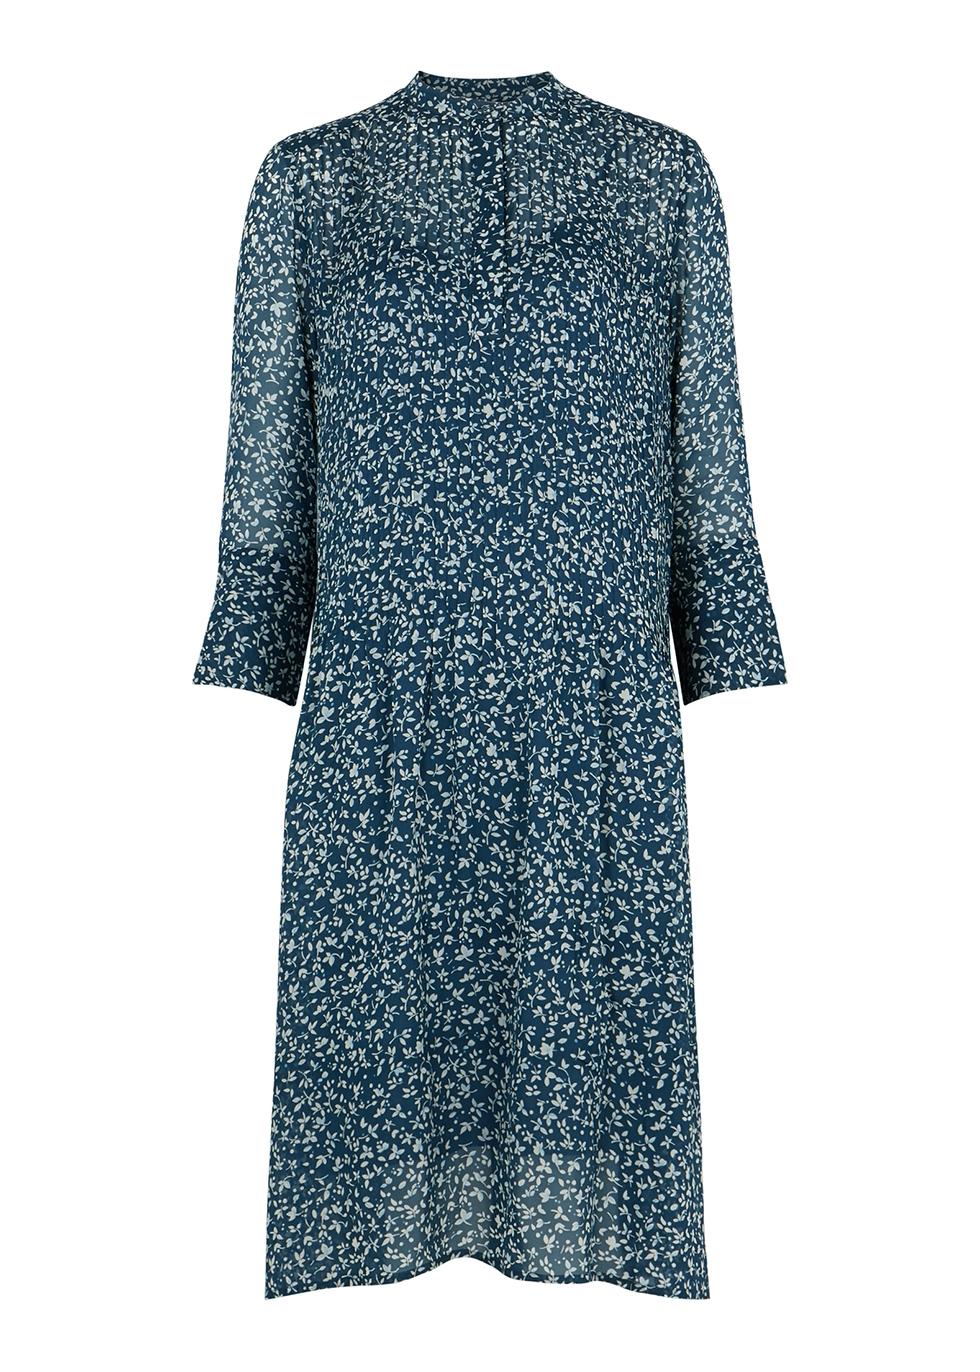 Elm floral-print chiffon shirt dress